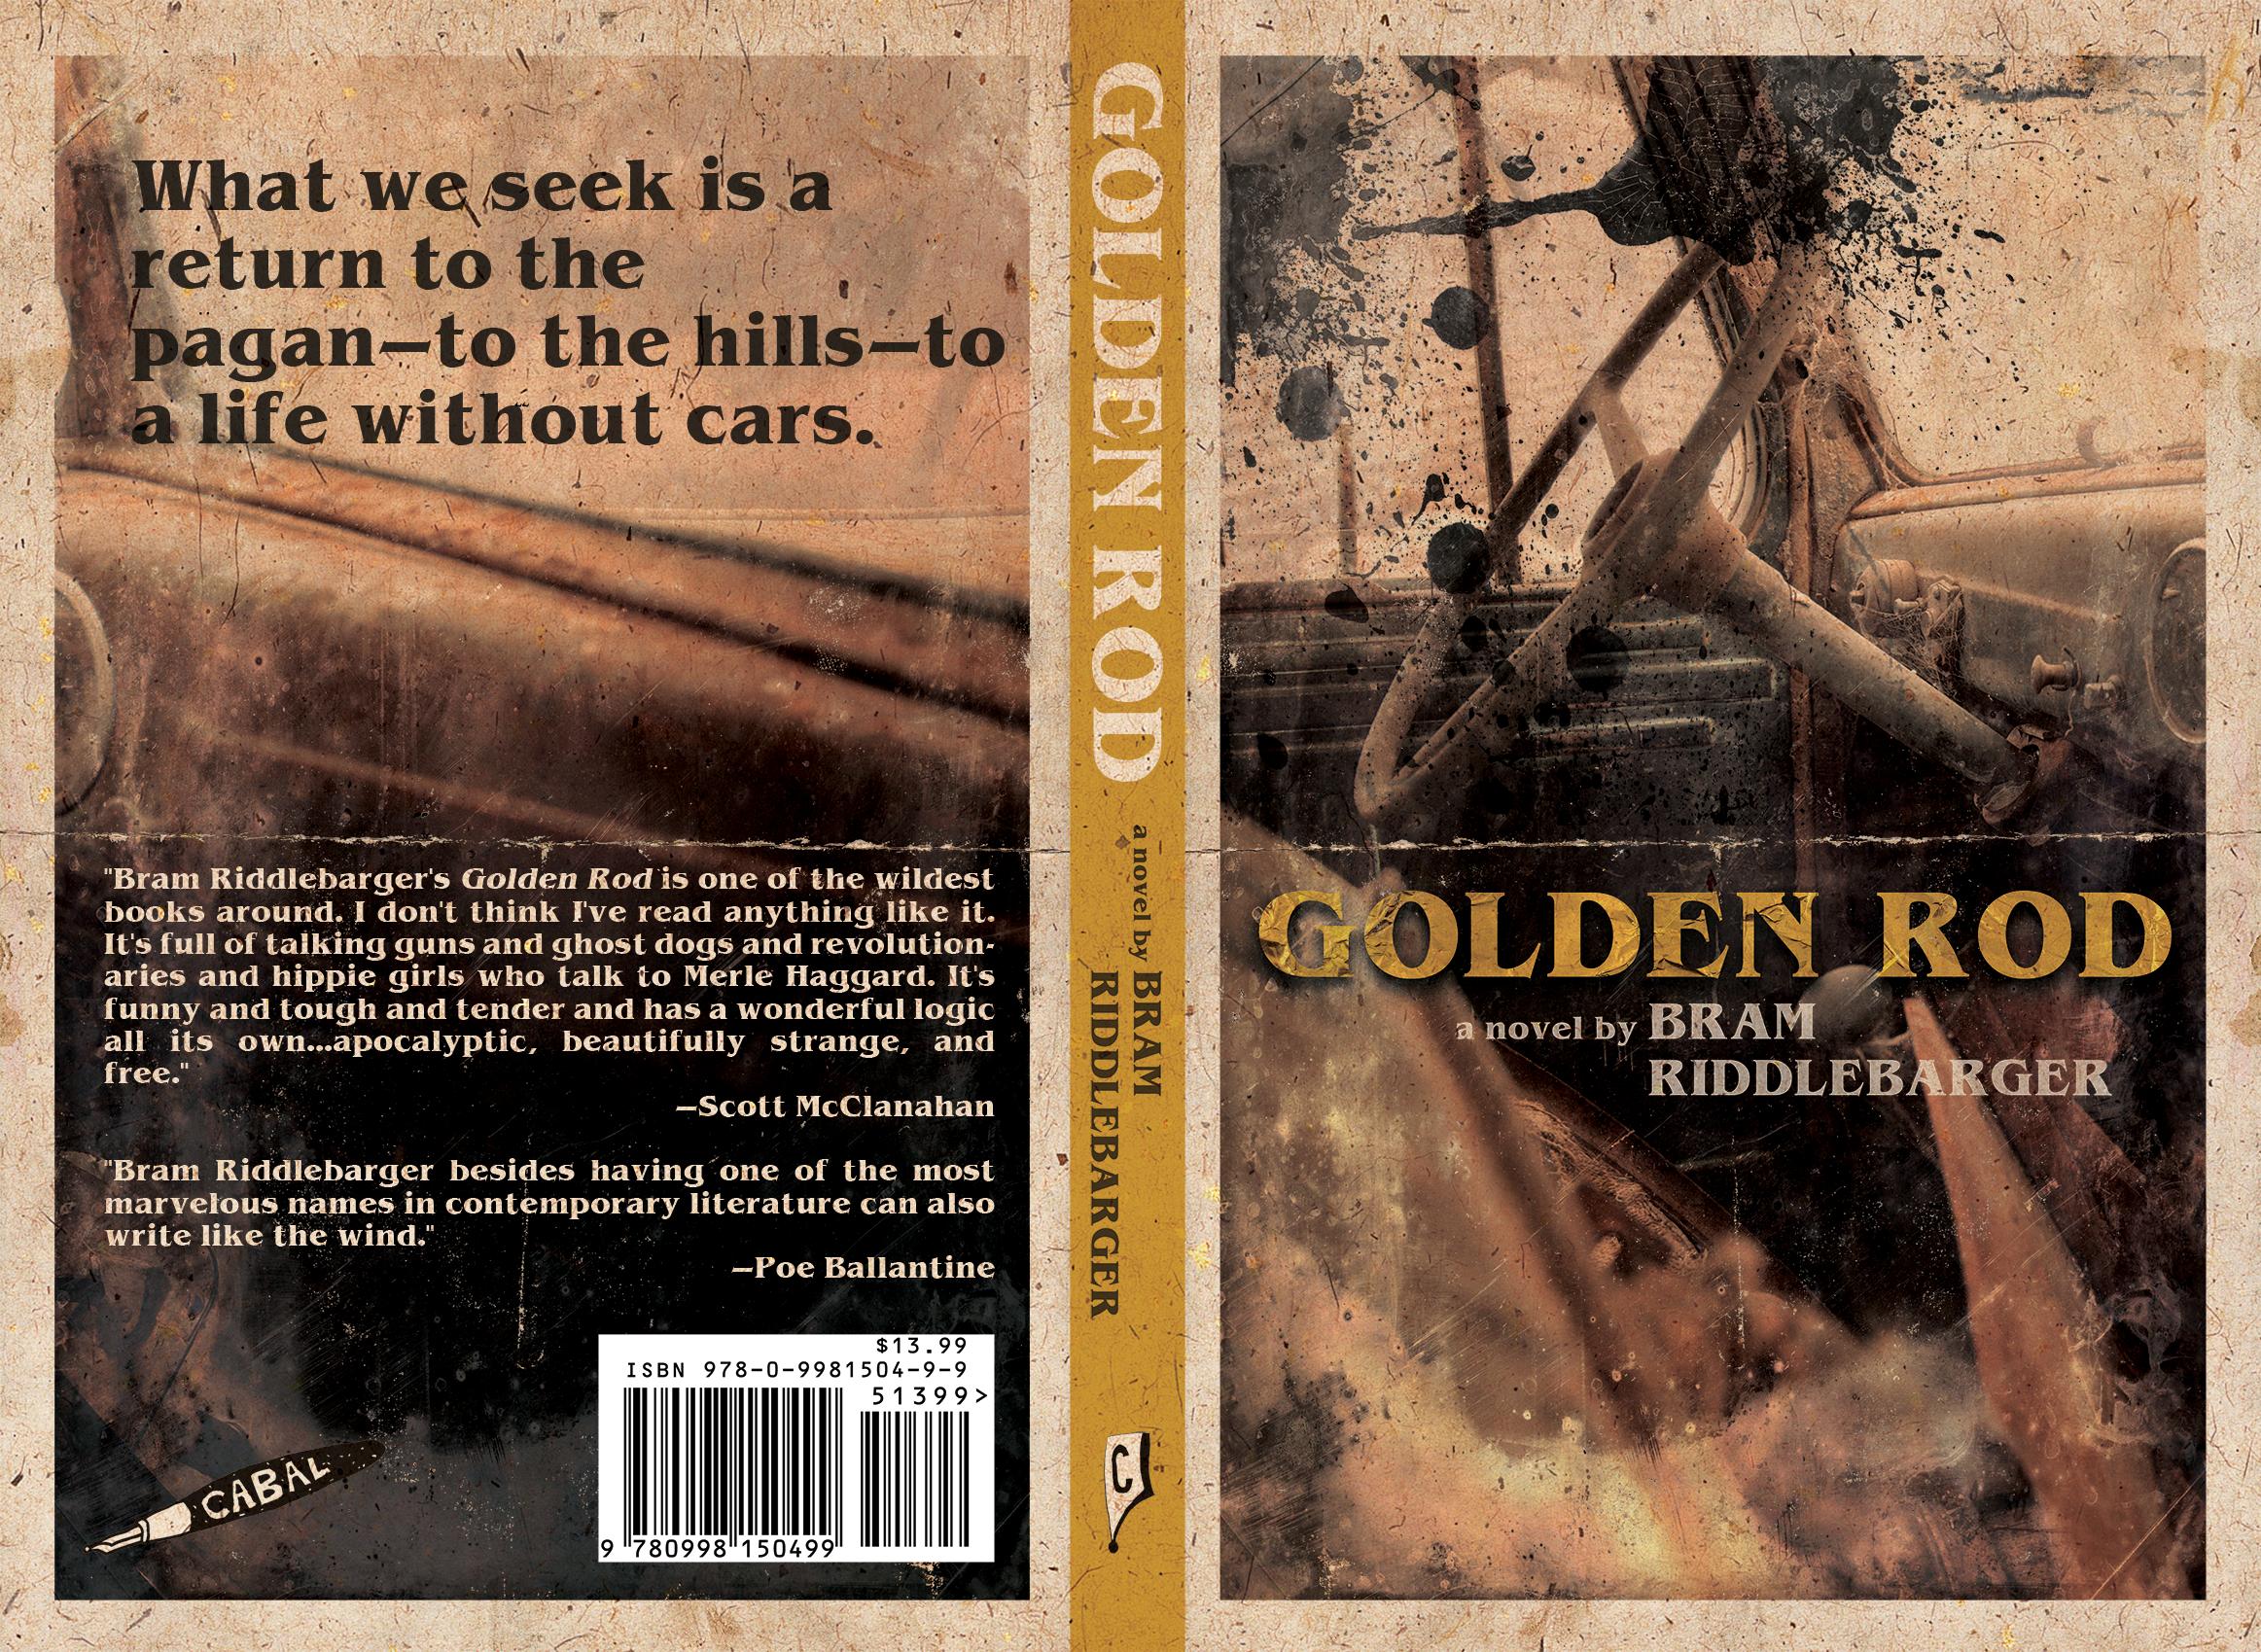 golden rod wrap.png